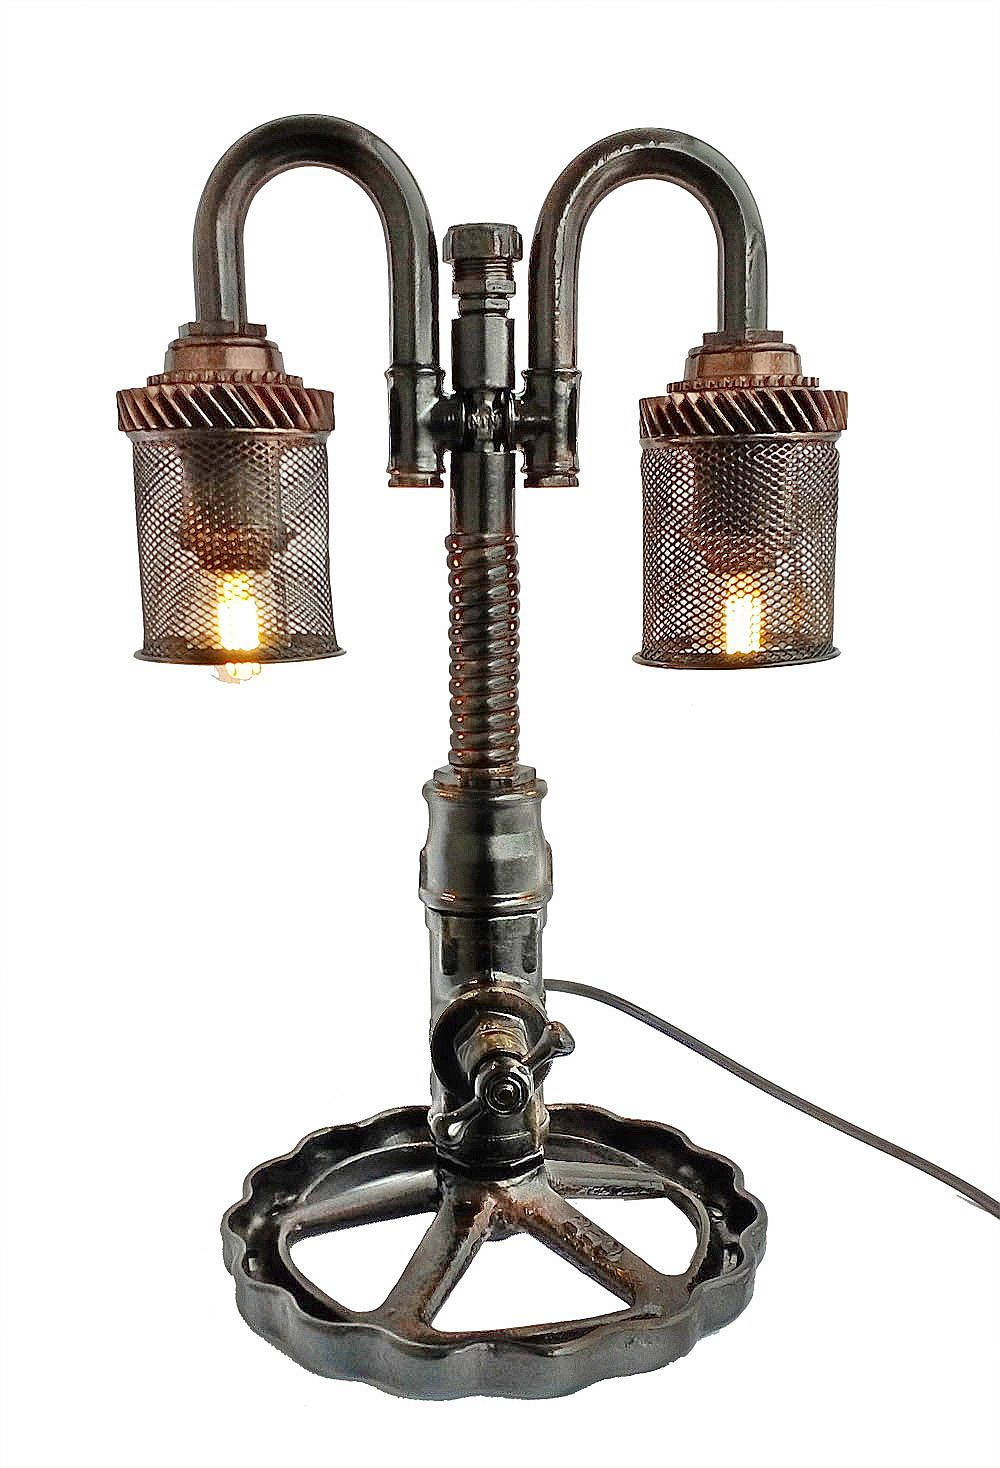 Industrial steampunk lighting, Steampunk industrial lamp